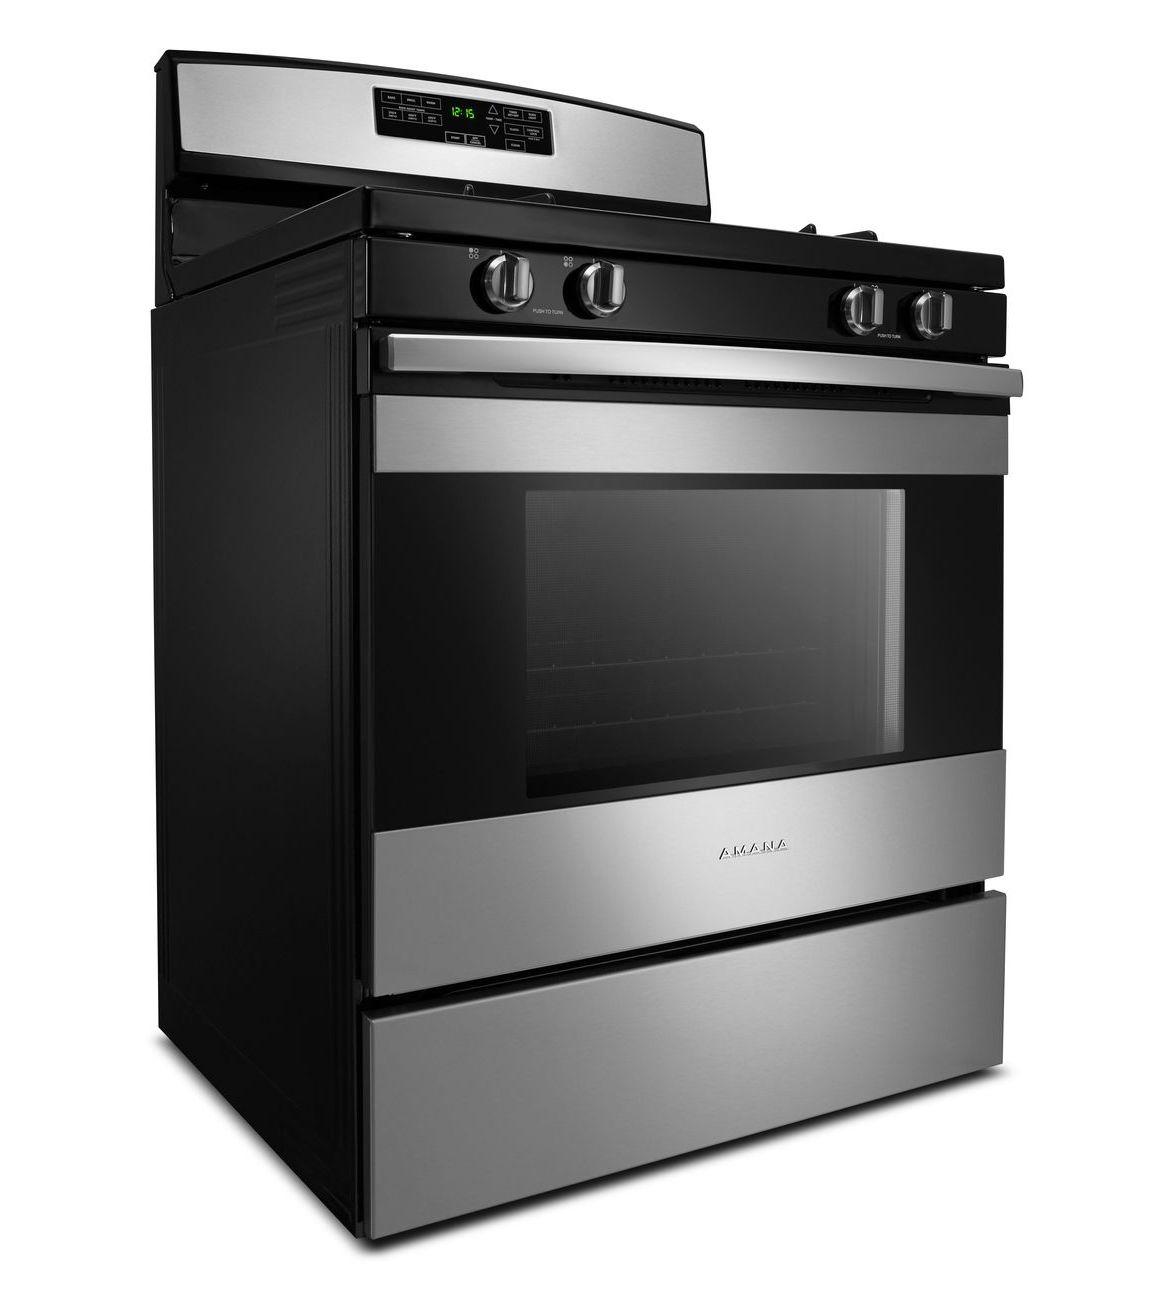 agr6603sfb 30 inch gas range with self clean option. Black Bedroom Furniture Sets. Home Design Ideas